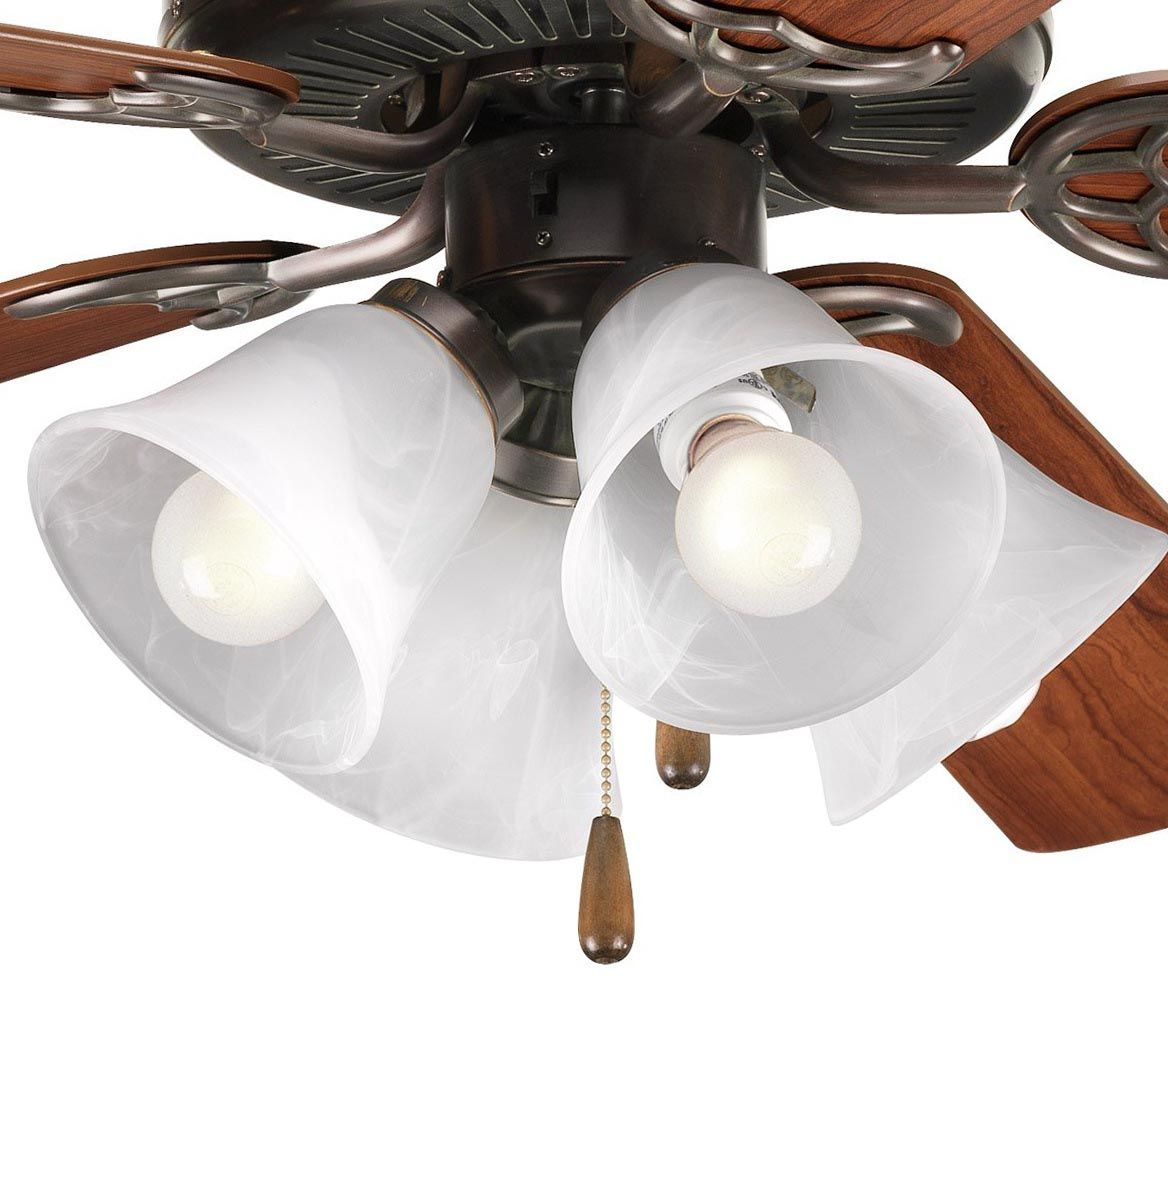 Chandelier attachment for ceiling fan chandeliers pinterest chandelier attachment for ceiling fan arubaitofo Images